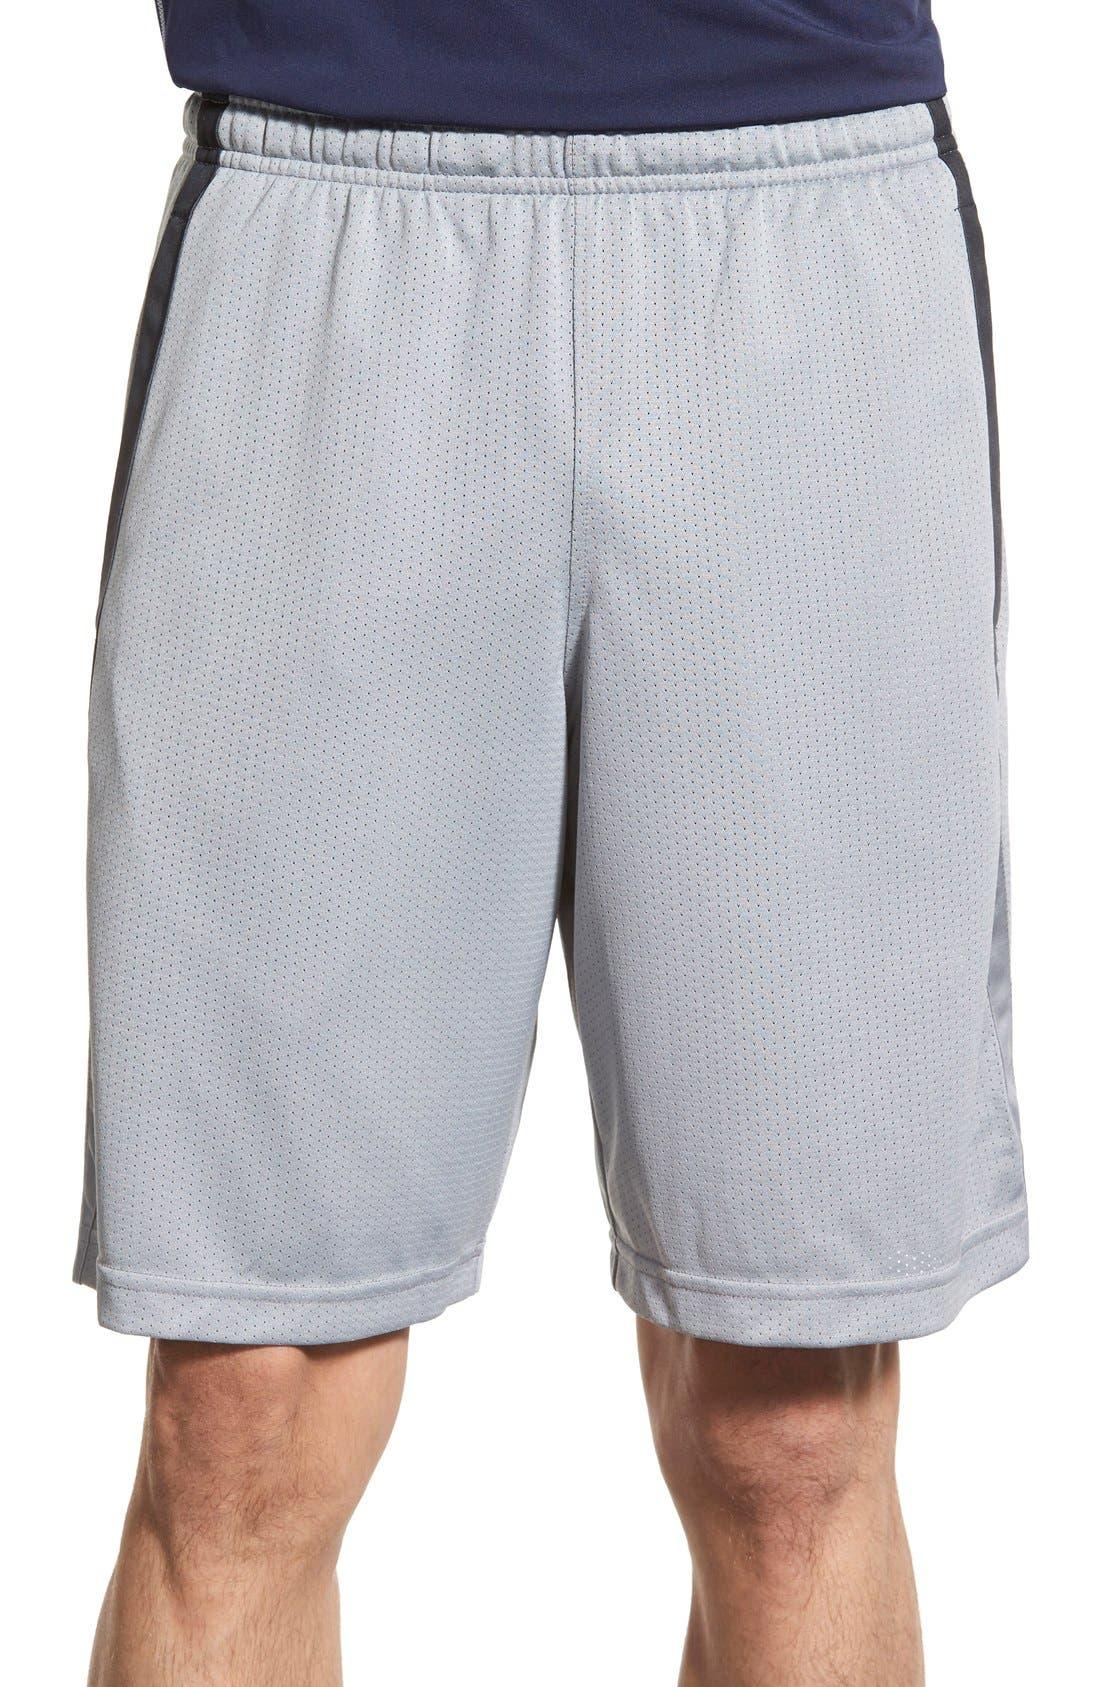 Under Armour 'UA Tech' HeatGear® Training Shorts